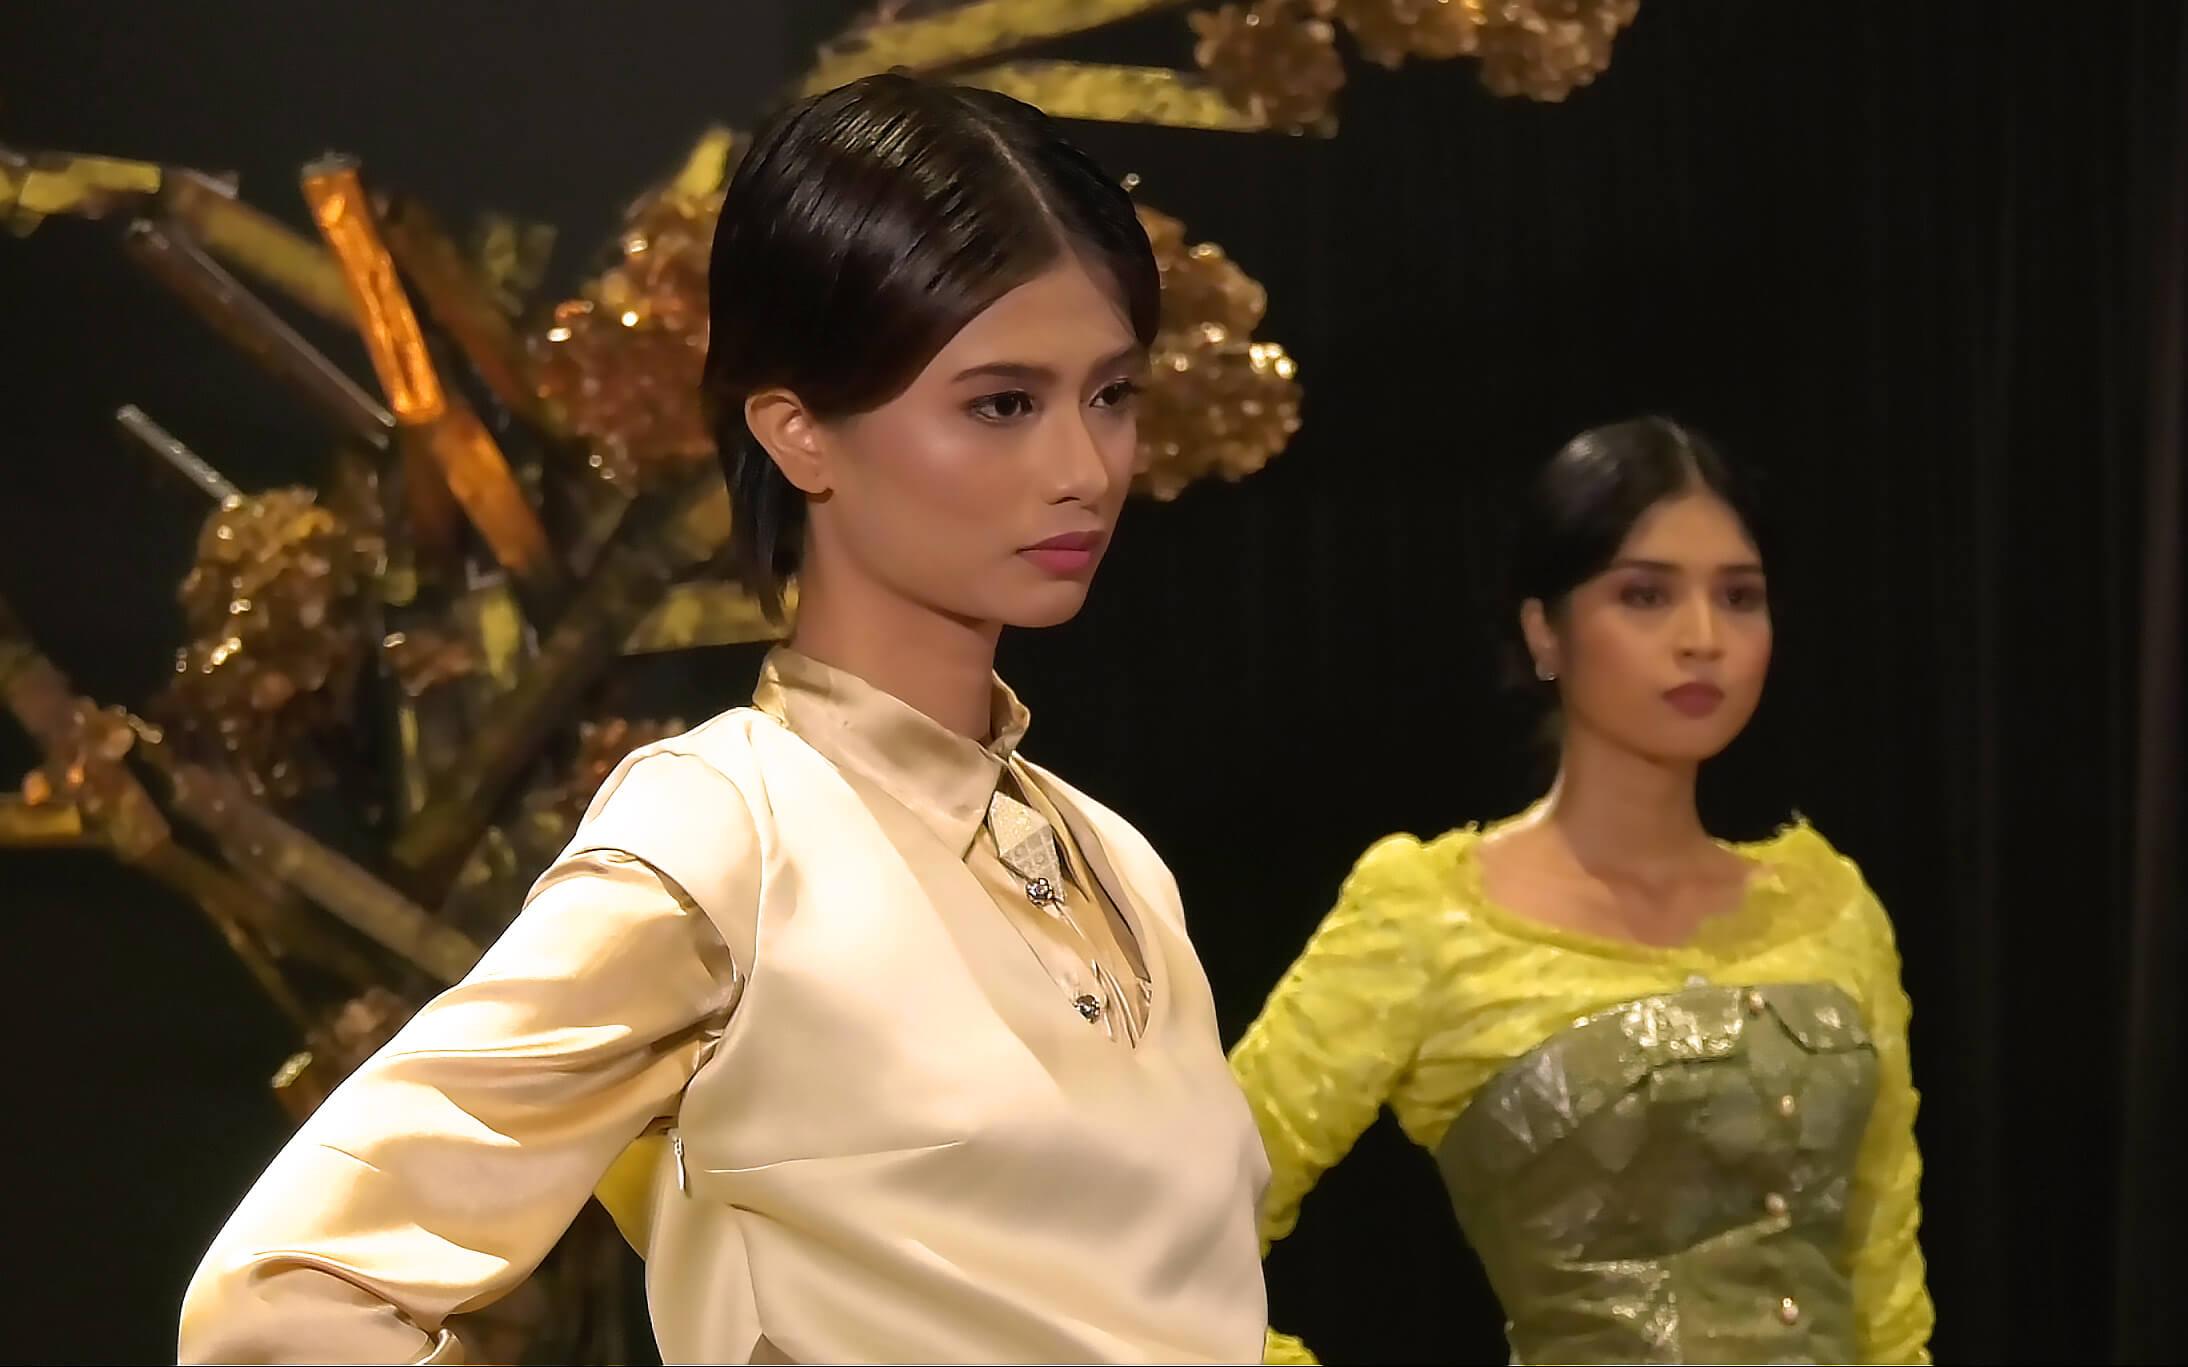 Arab Street URA Raffles Recreating the Textile Culture Collaboration from One Kampung Glam Cahaya Ramadan Live Stream Fashion Show 11